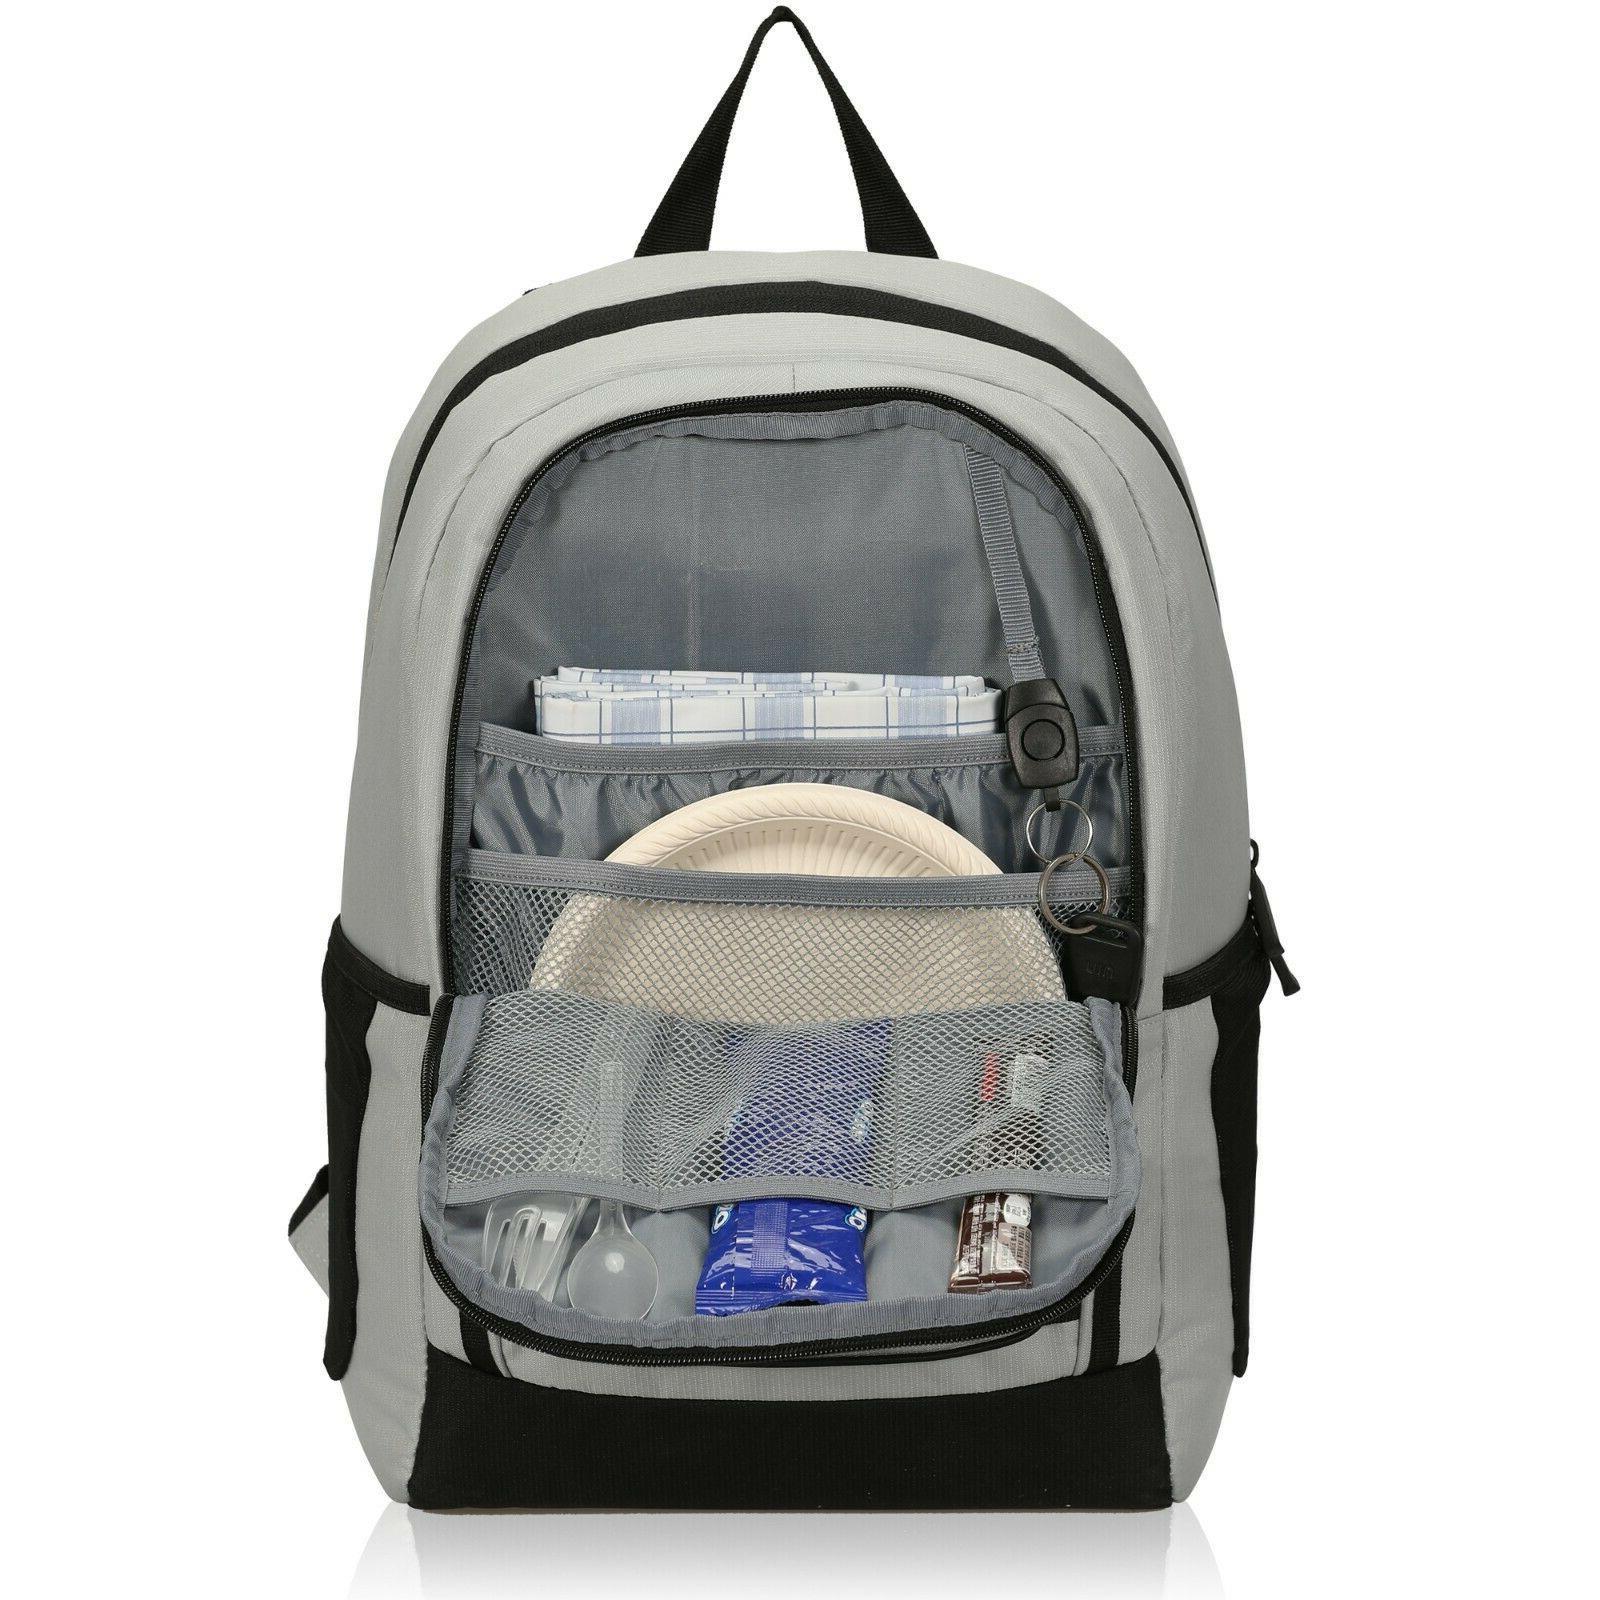 27 Cans Backpack Leakproof Soft Bag Lightweight